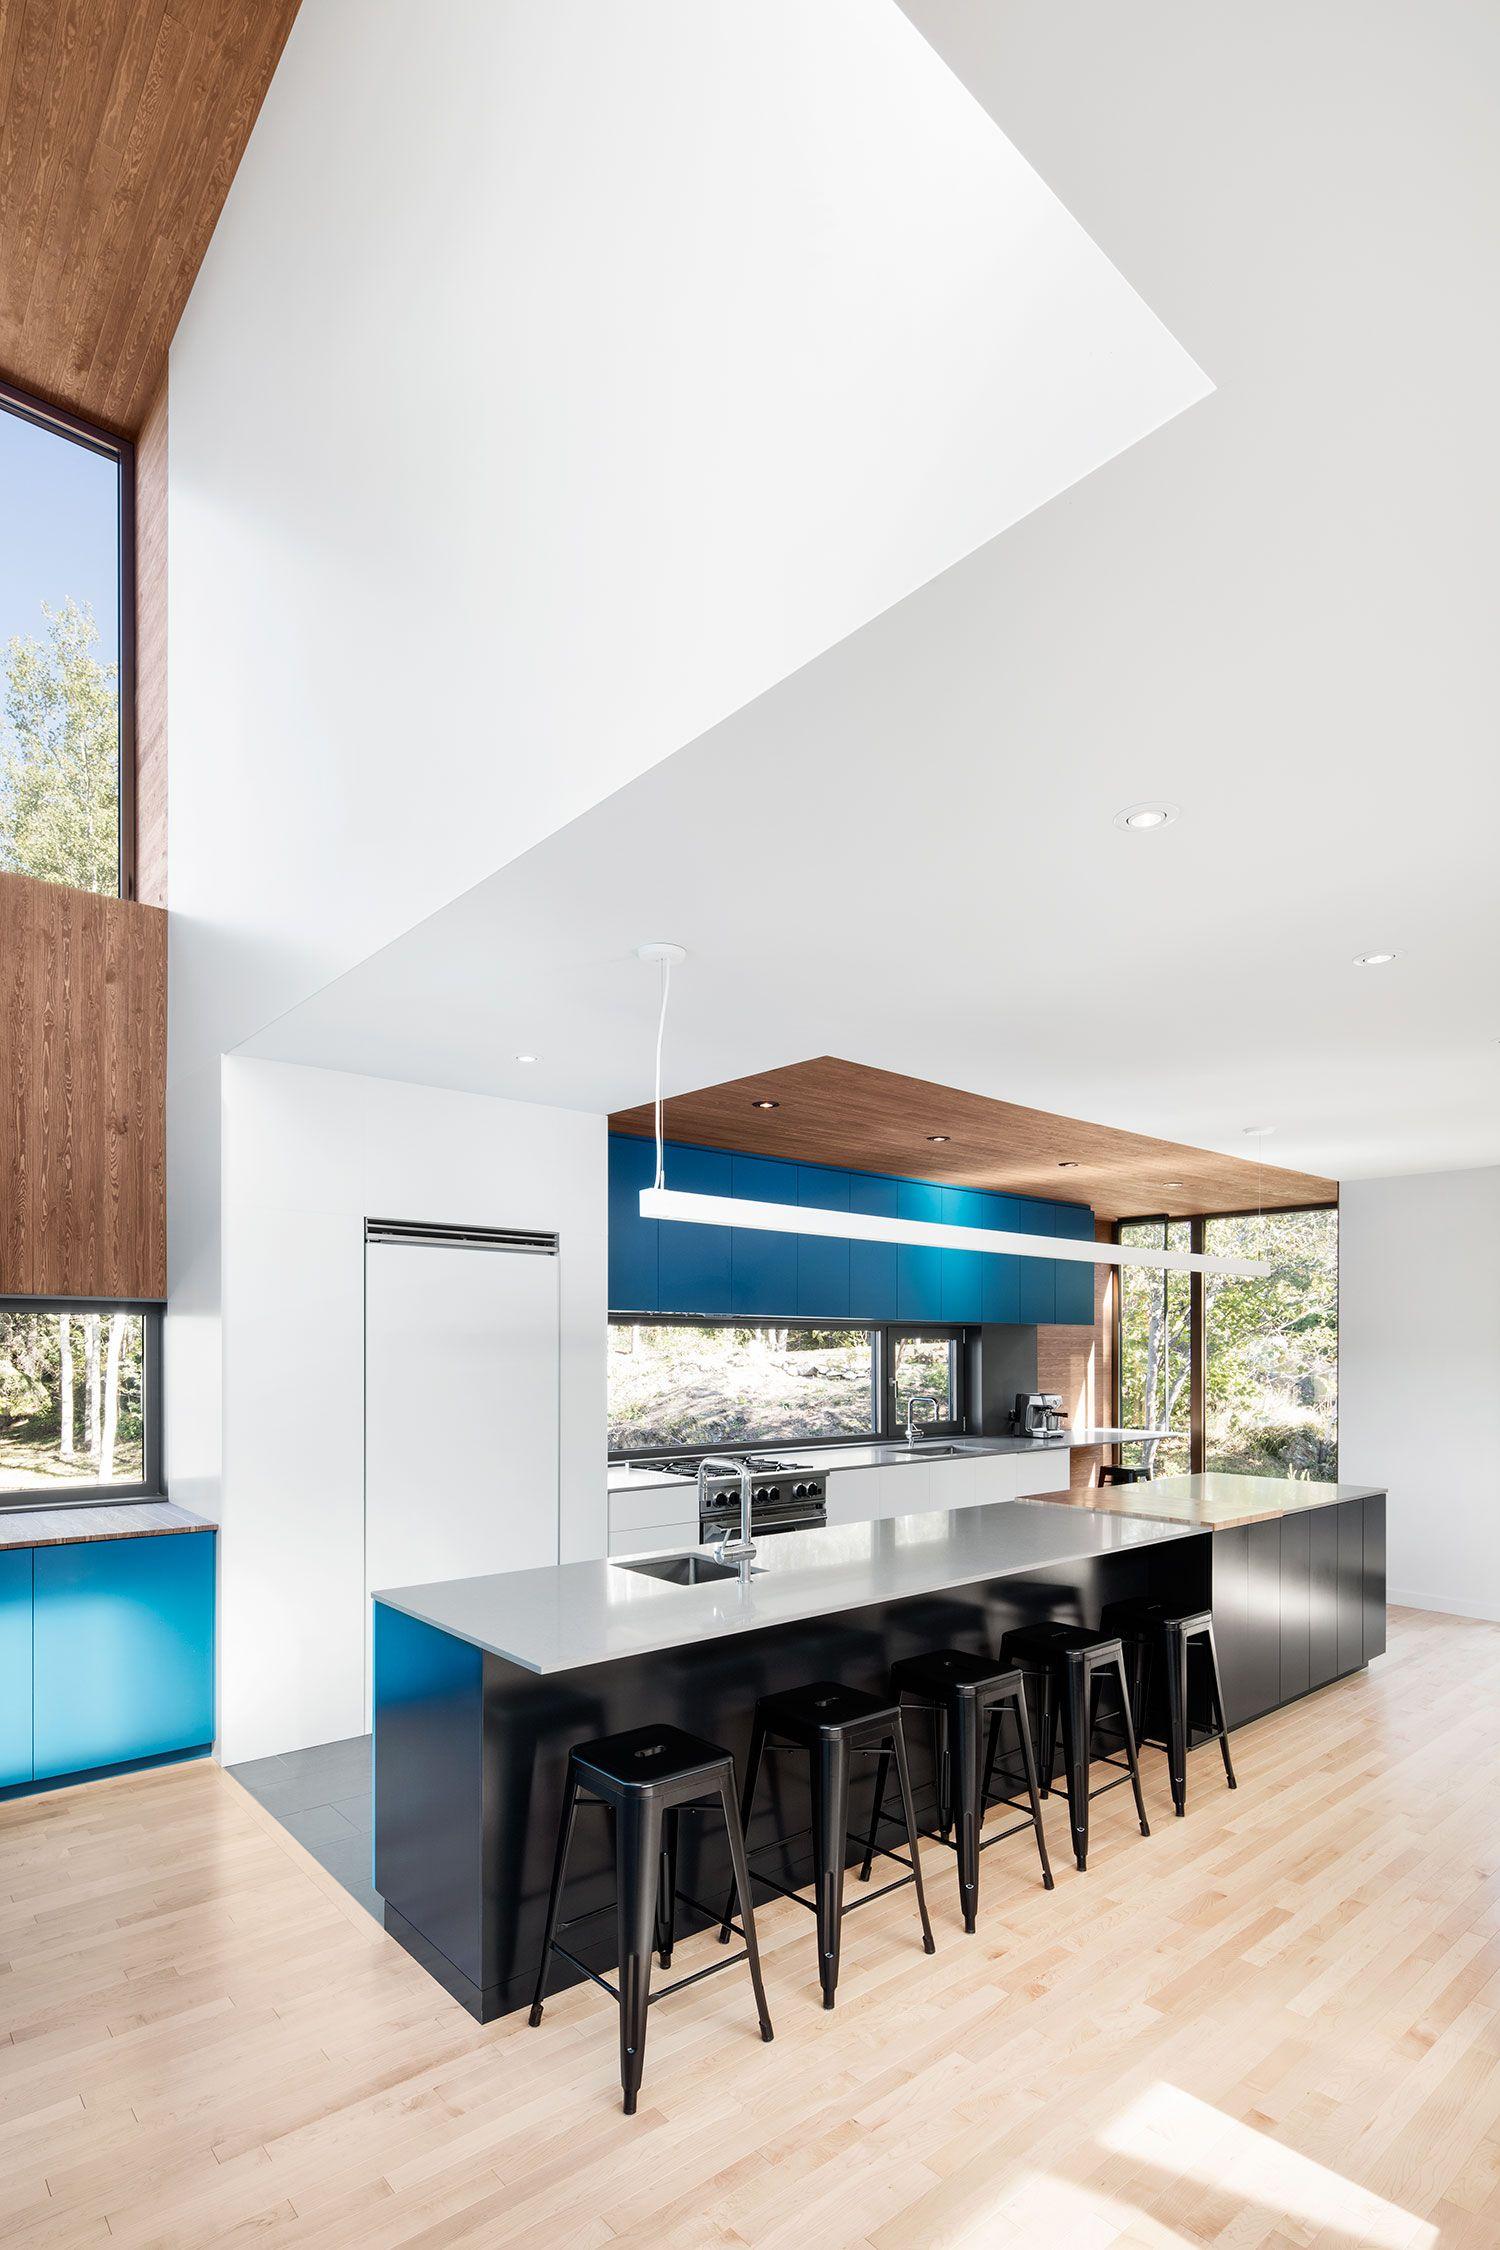 Casa Bic  Cuisine design moderne, Maison minimaliste, Maison